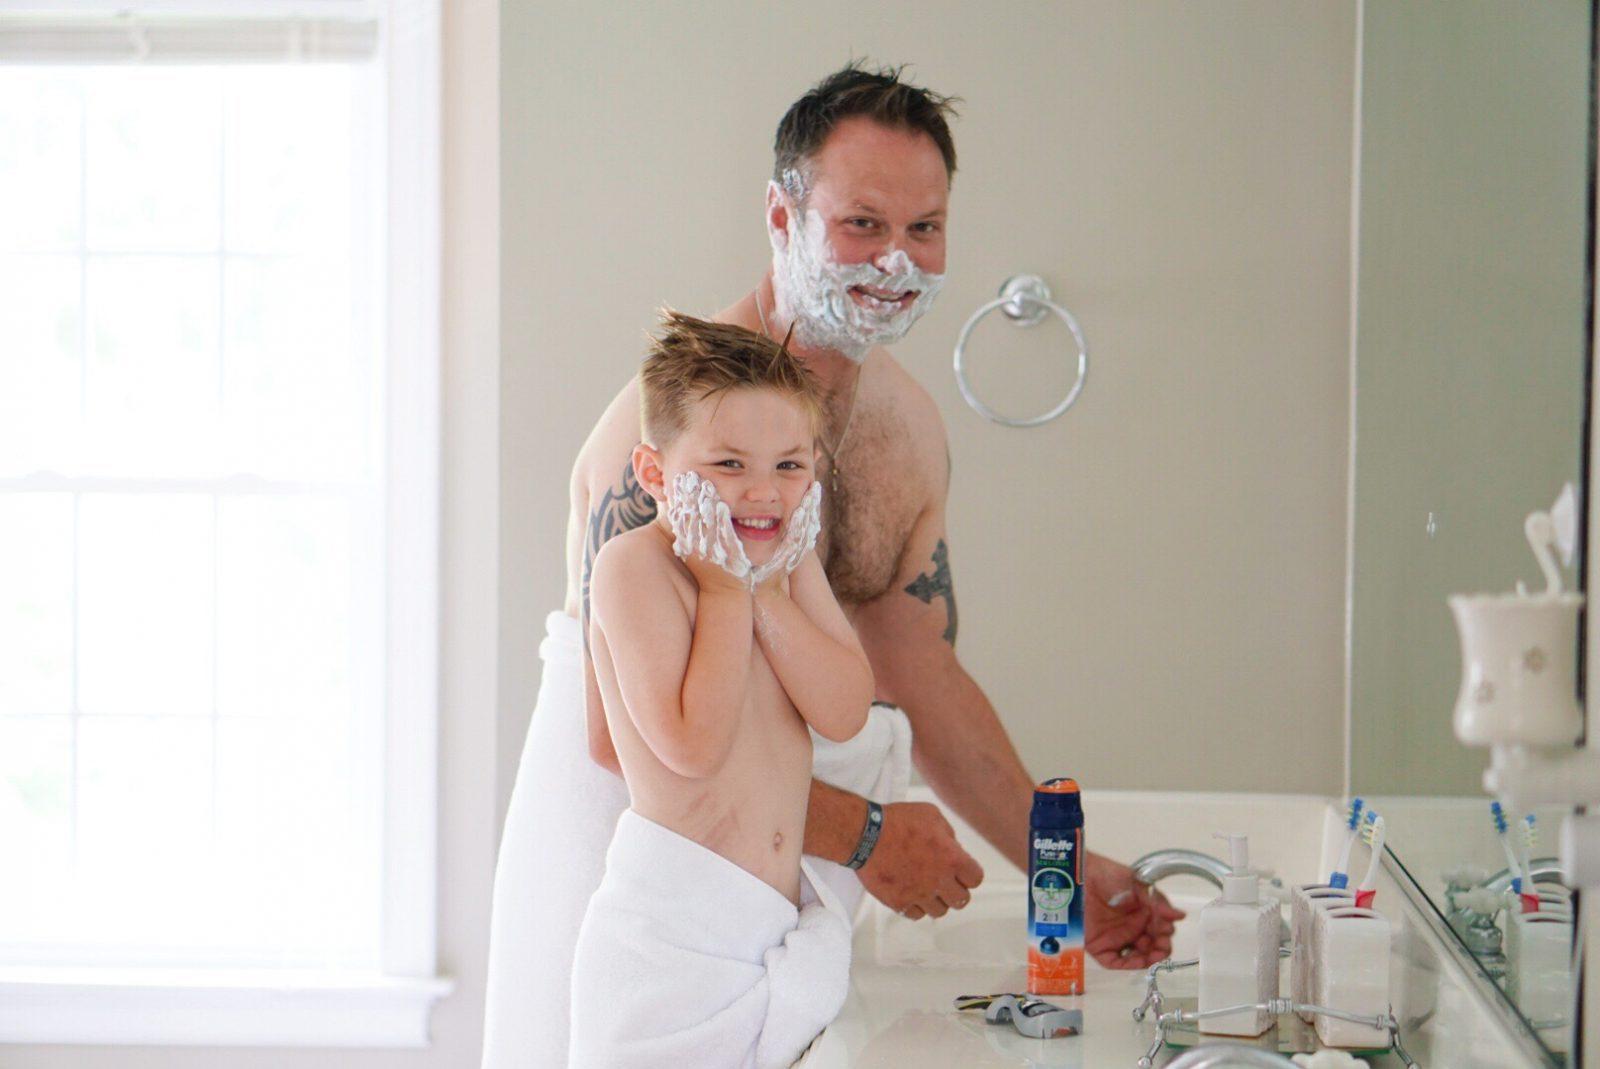 Father's Day Gift Ideas via Misty Nelson, frostedblog.com @frostedevents #fathersday #fathersdaygifts